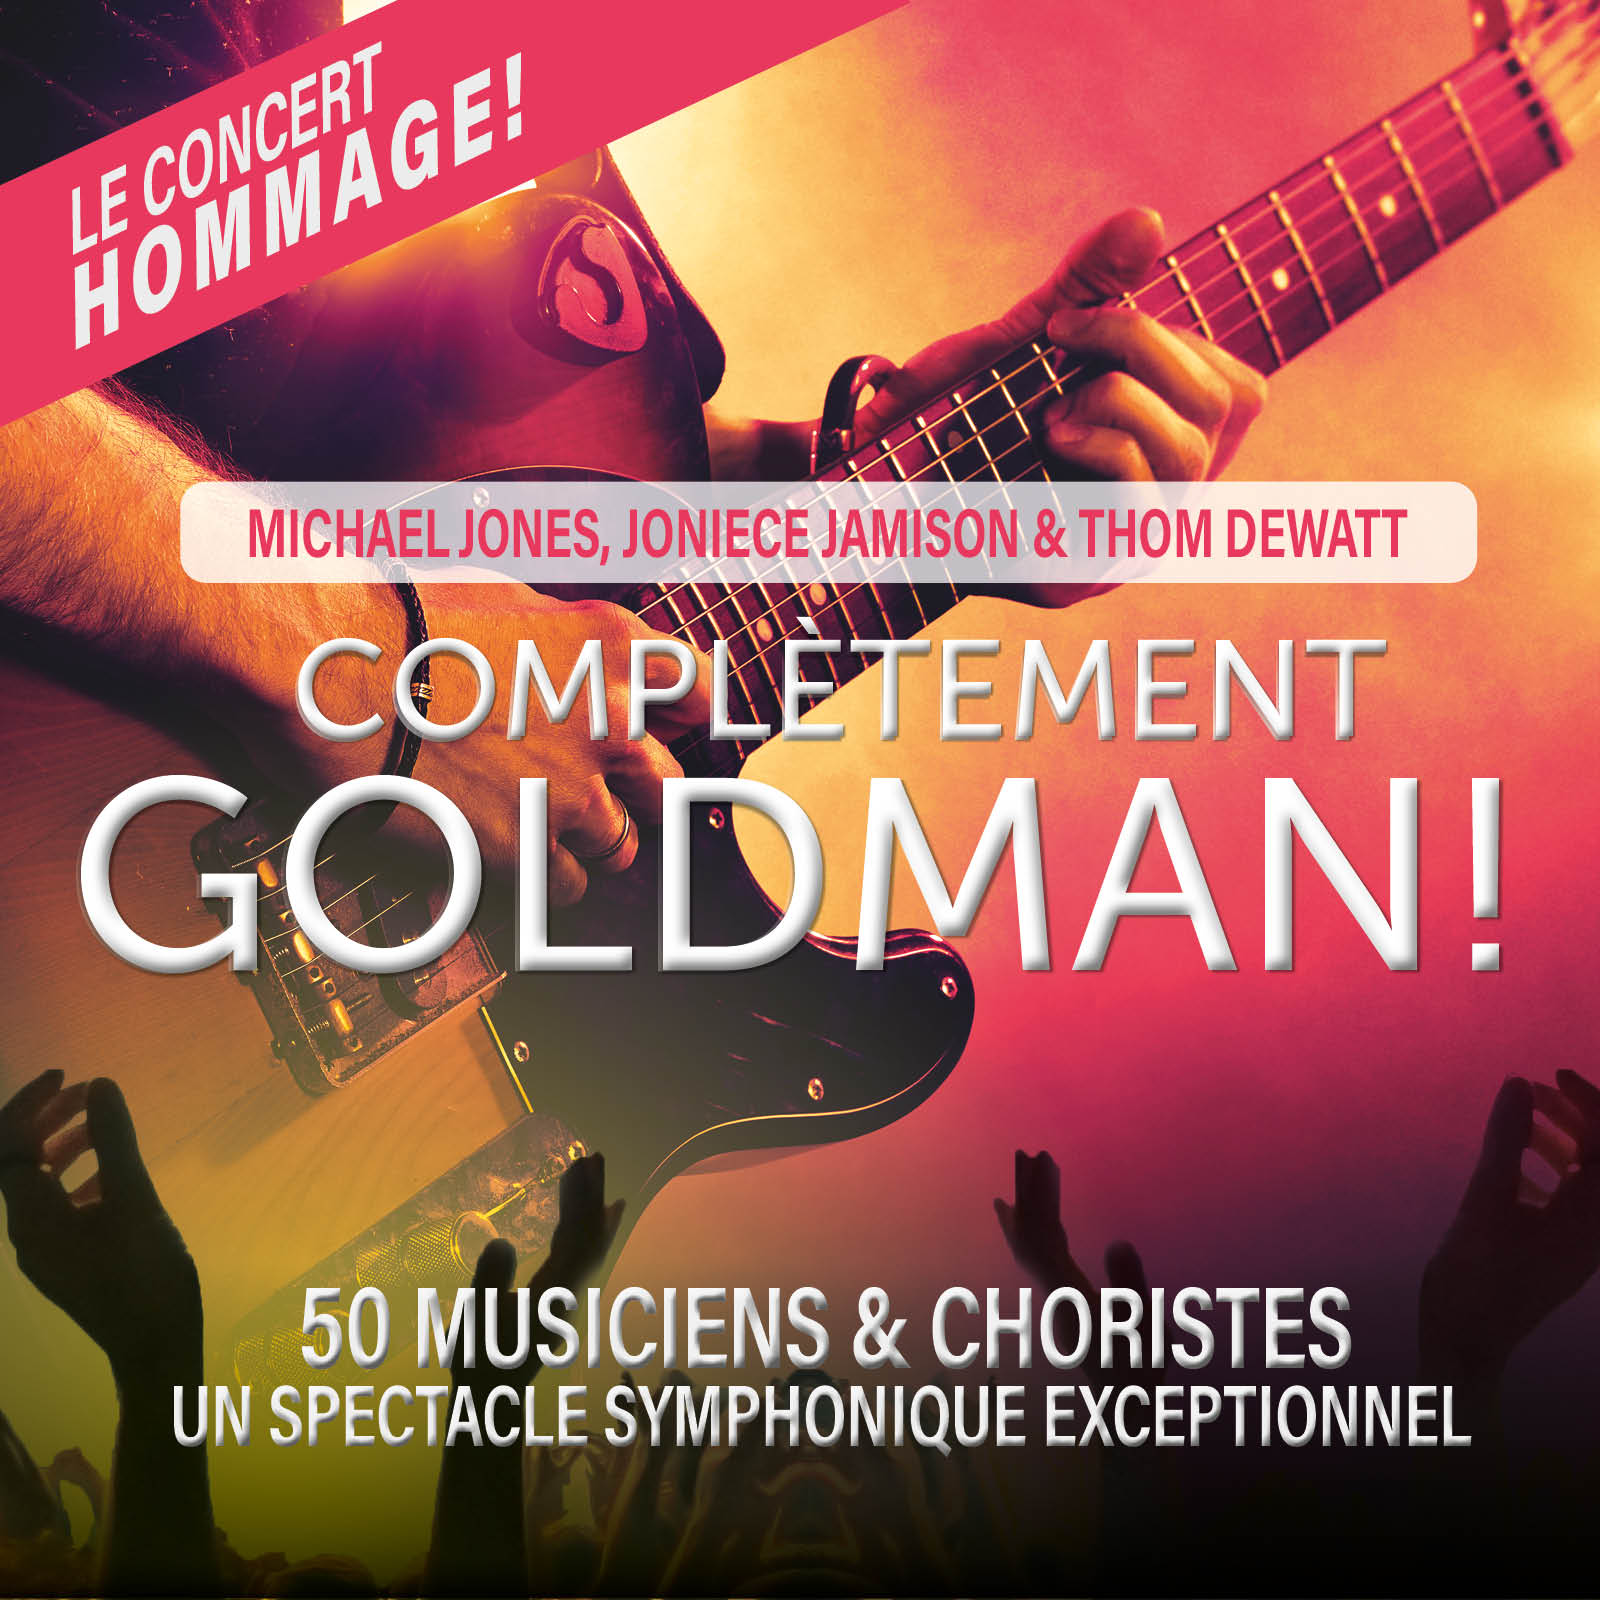 Complètement GOLDMAN!, Michael Jones, Joniece Jamison & Thom Dewatt, Le concert Hommage!